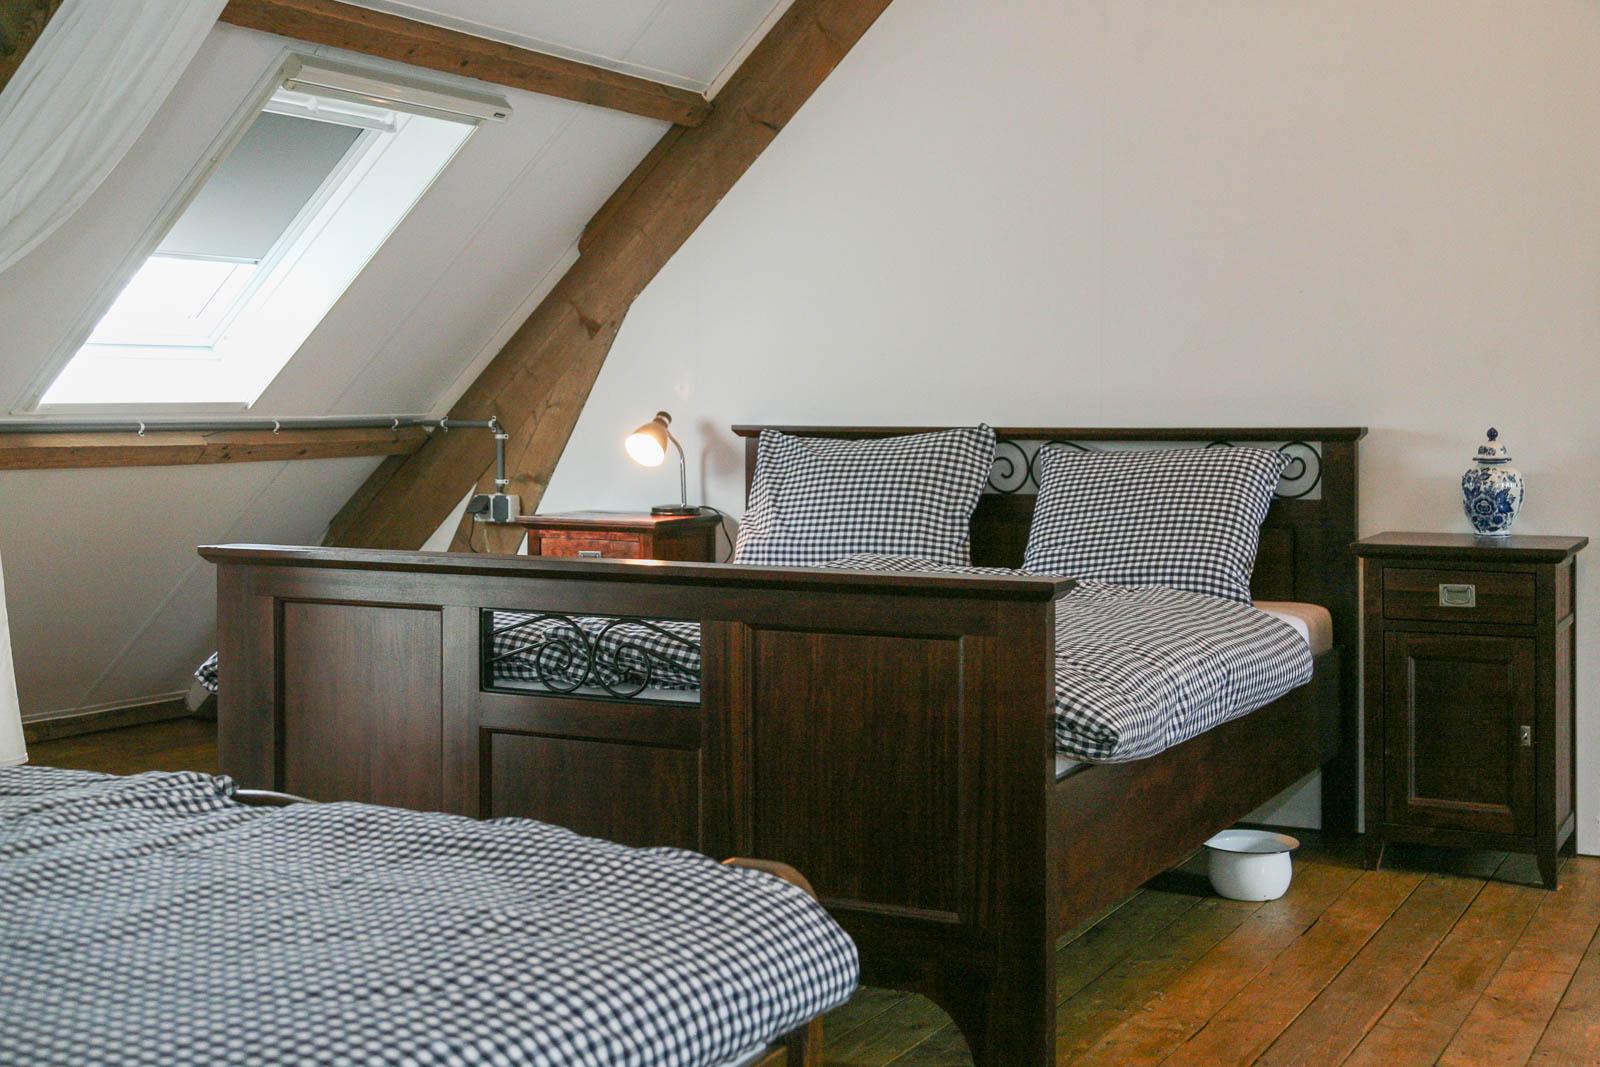 Hillegondahoeve-De Oude Stal-1446